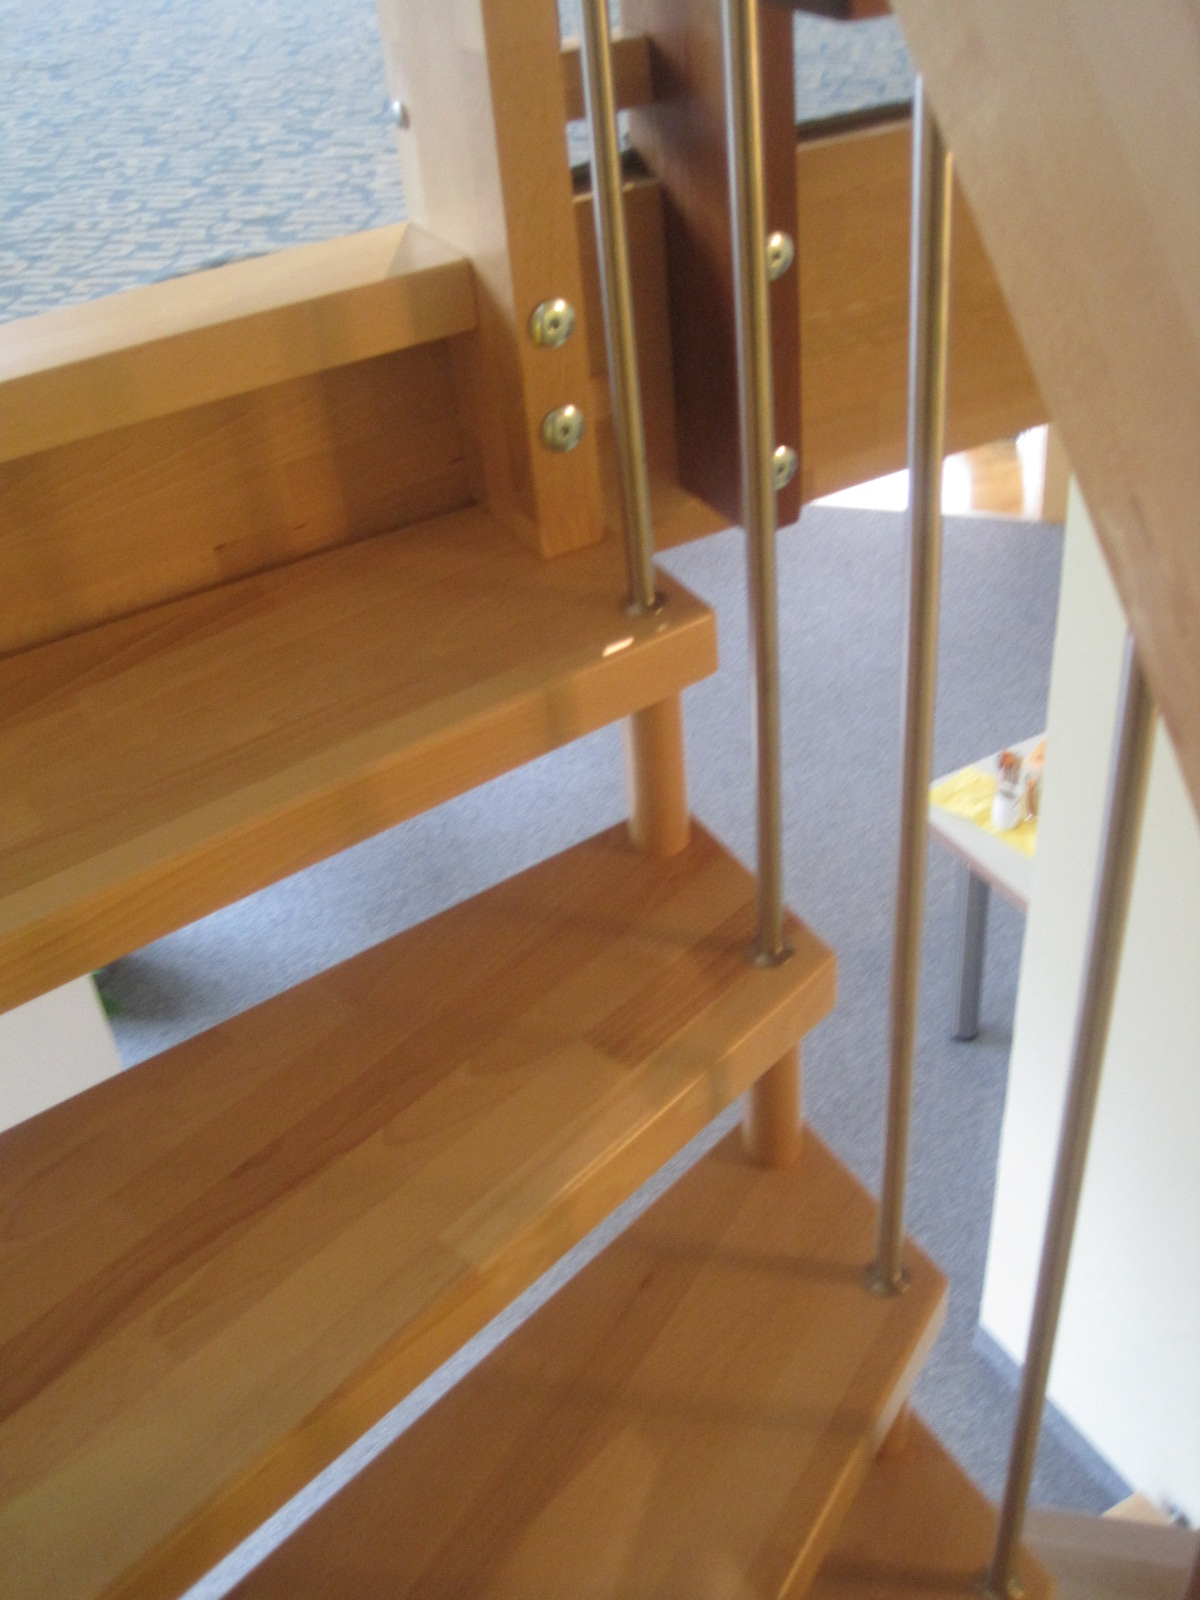 das noriplana bautagebuch bemusterung treppe 1 bauer treppen cadolzburg. Black Bedroom Furniture Sets. Home Design Ideas